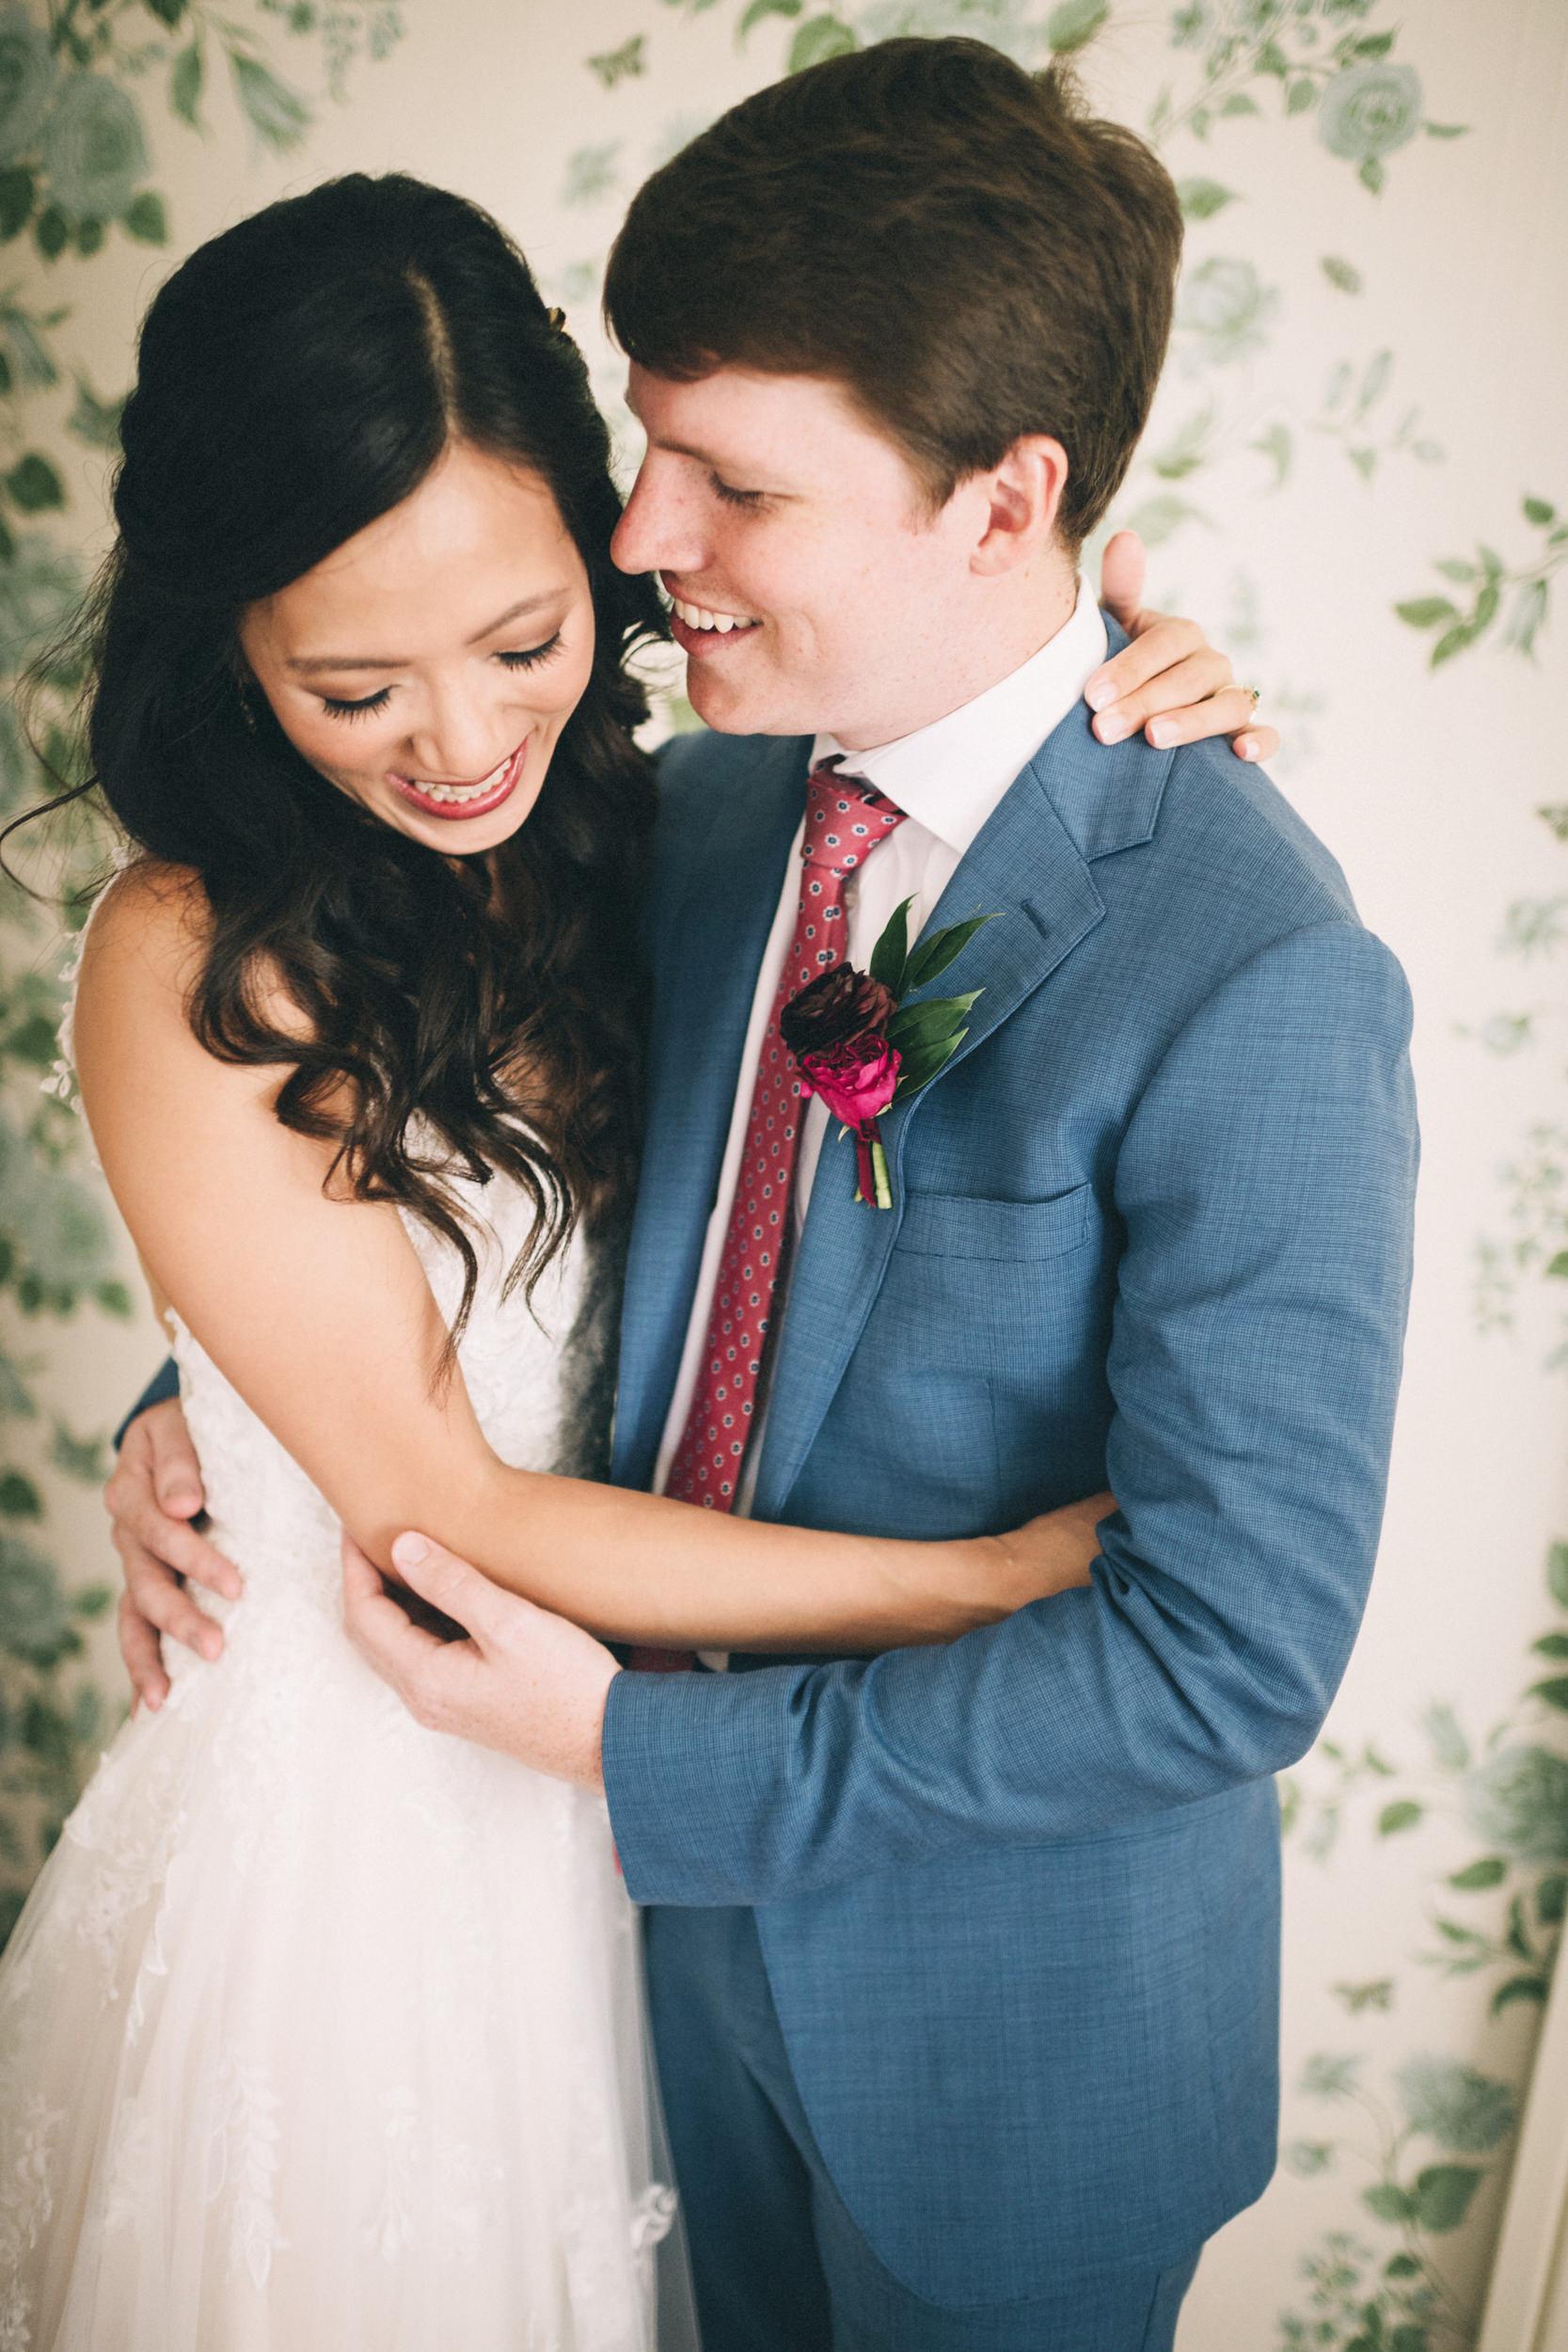 Louisville-Kentucky-Wedding-and-Elopement-Photographer-Sarah-Katherine-Davis-Photography-Summer-Jewel-Toned-Wedding-Chineese-Tea-Ceremony-Warrenwood-Manor-Danville-239.jpg